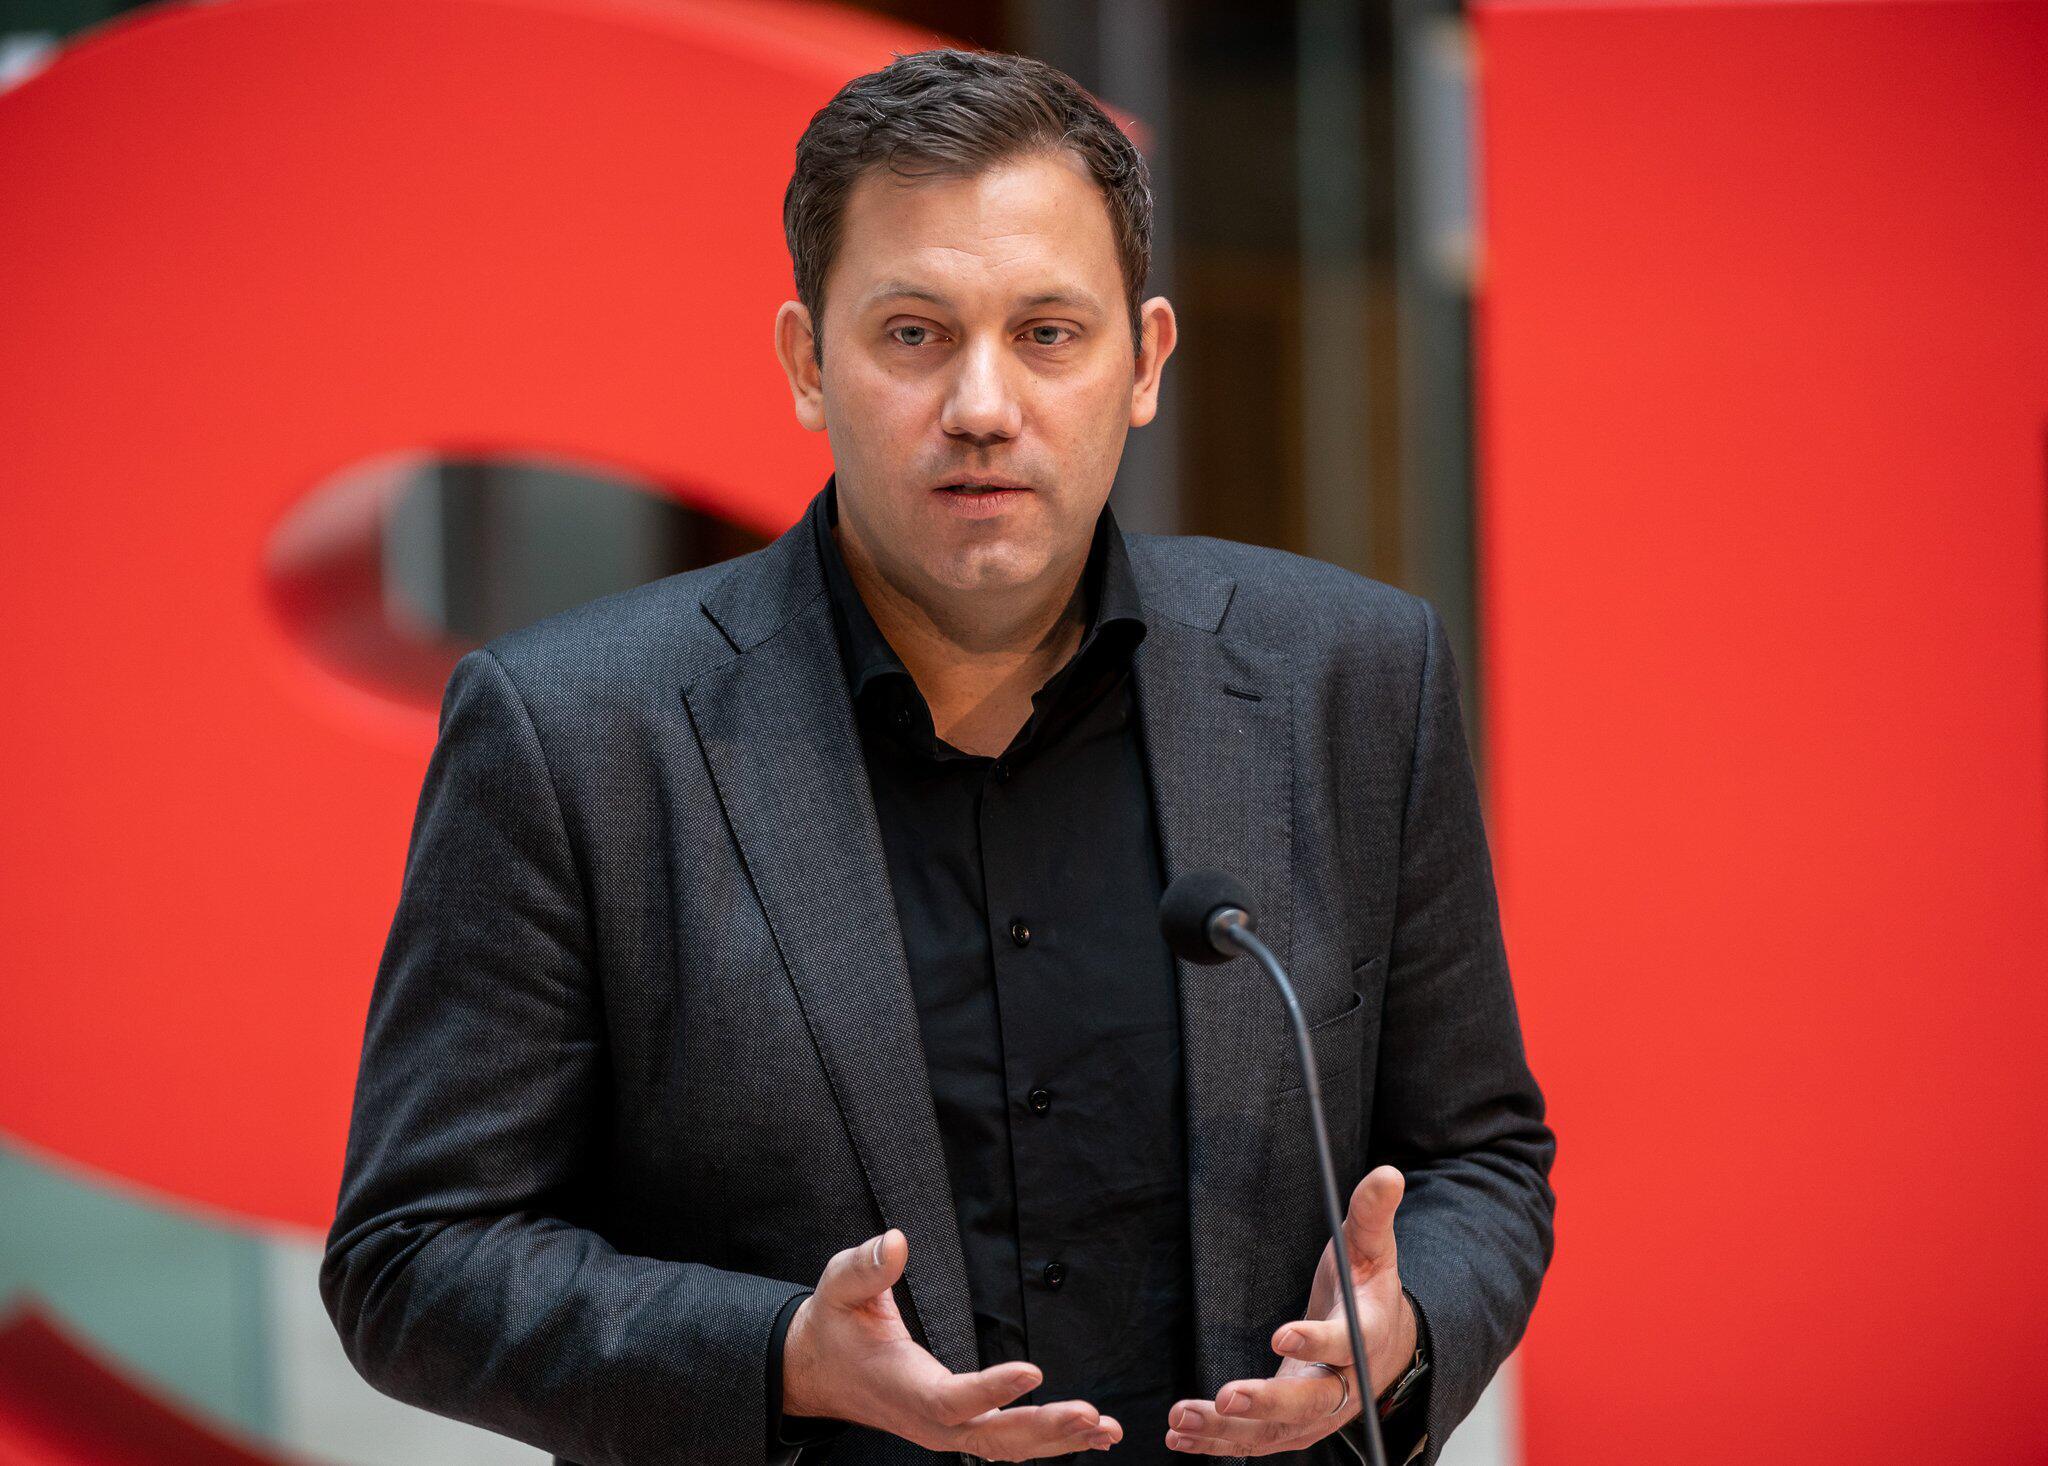 Bild zu SPD parliamentary group meeting in Berlin